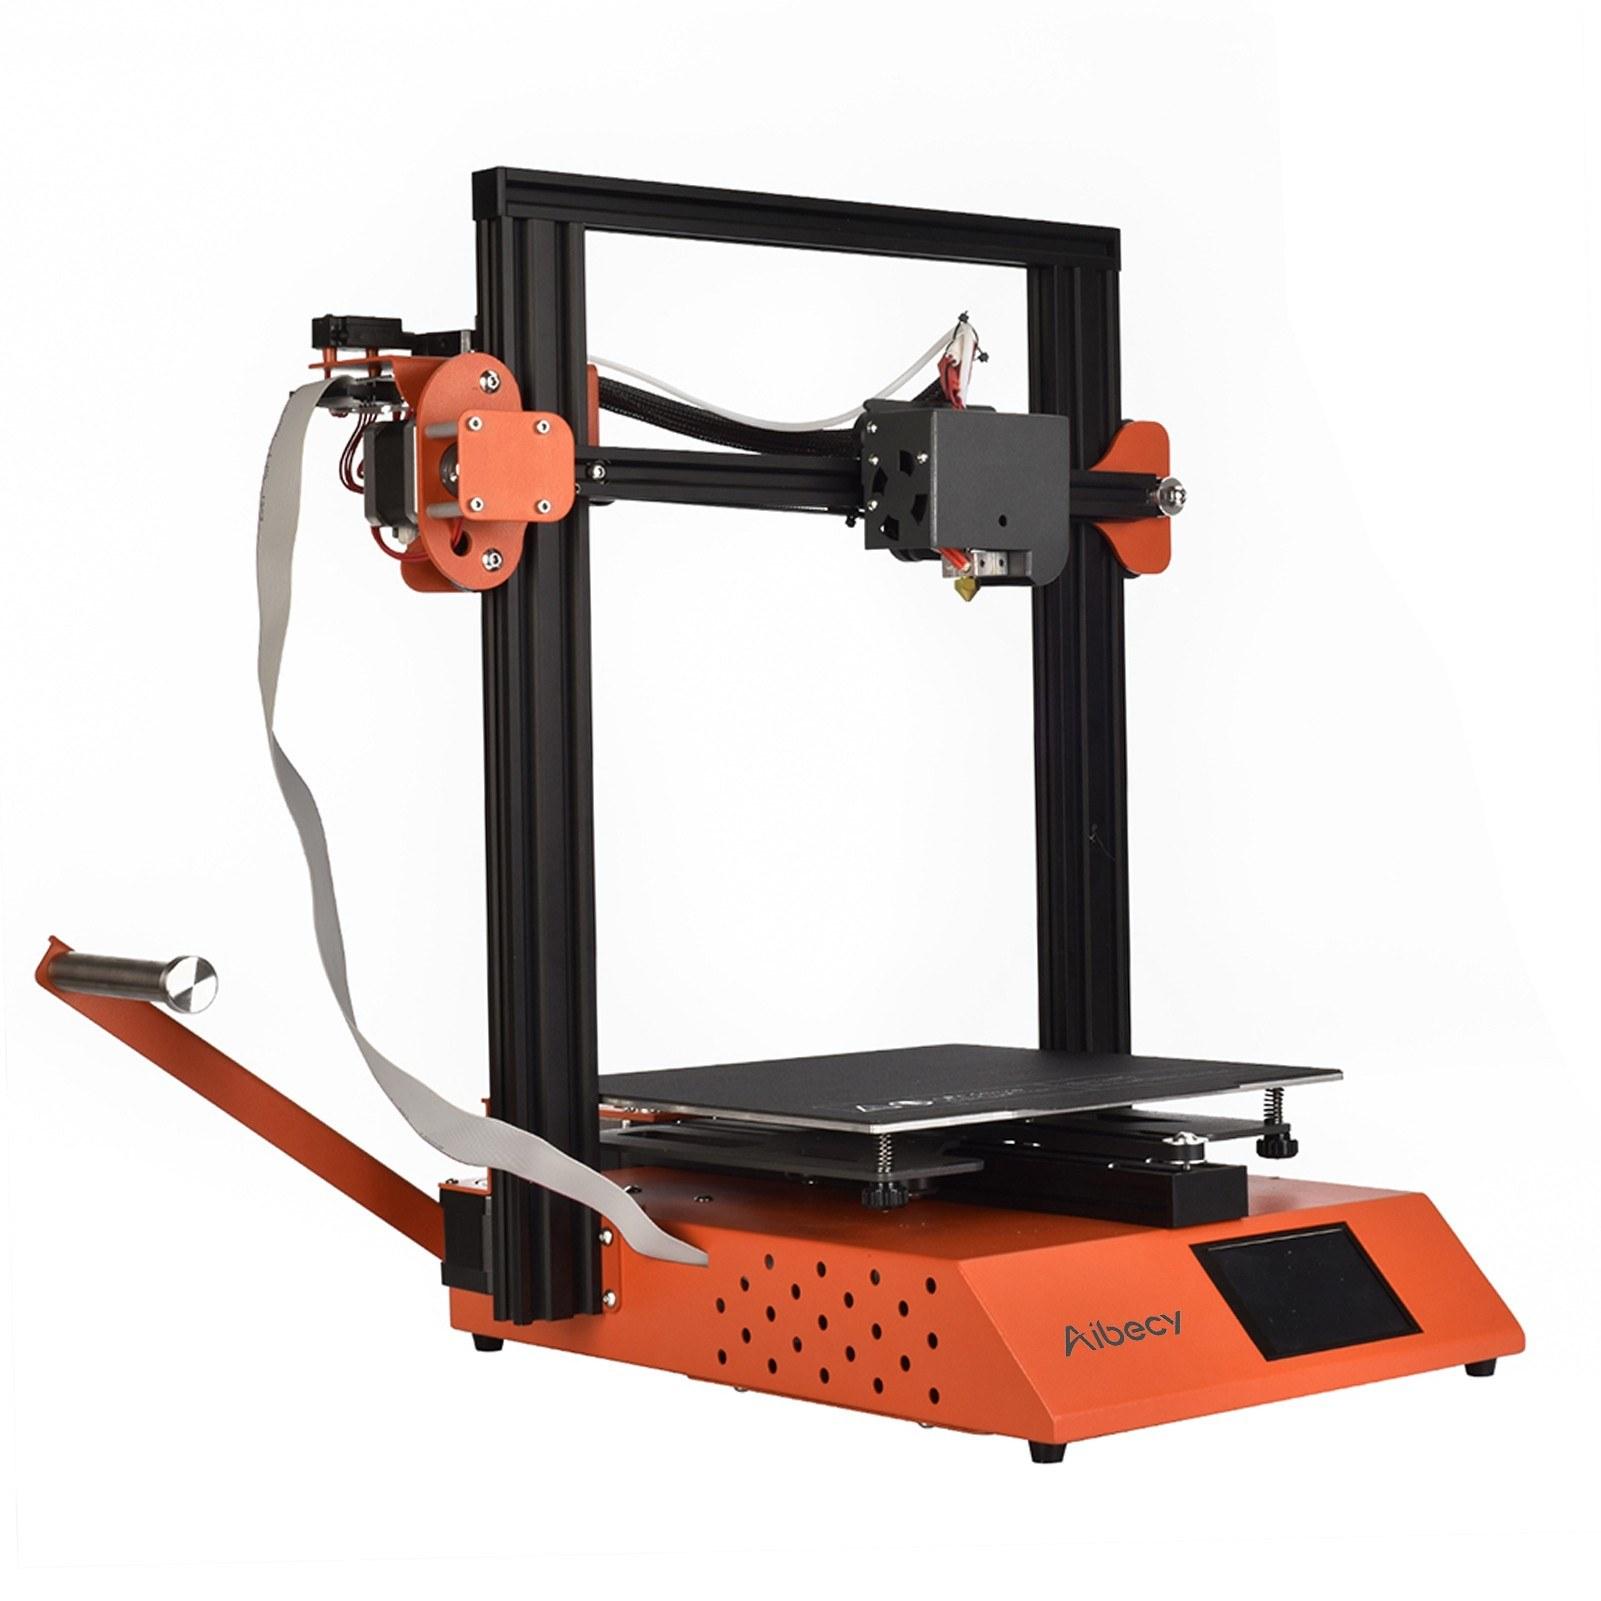 Cafago - 37% OFF Aibecy 115V/230V 360W 3D Printer DIY Kit Set,free shipping+$202.12